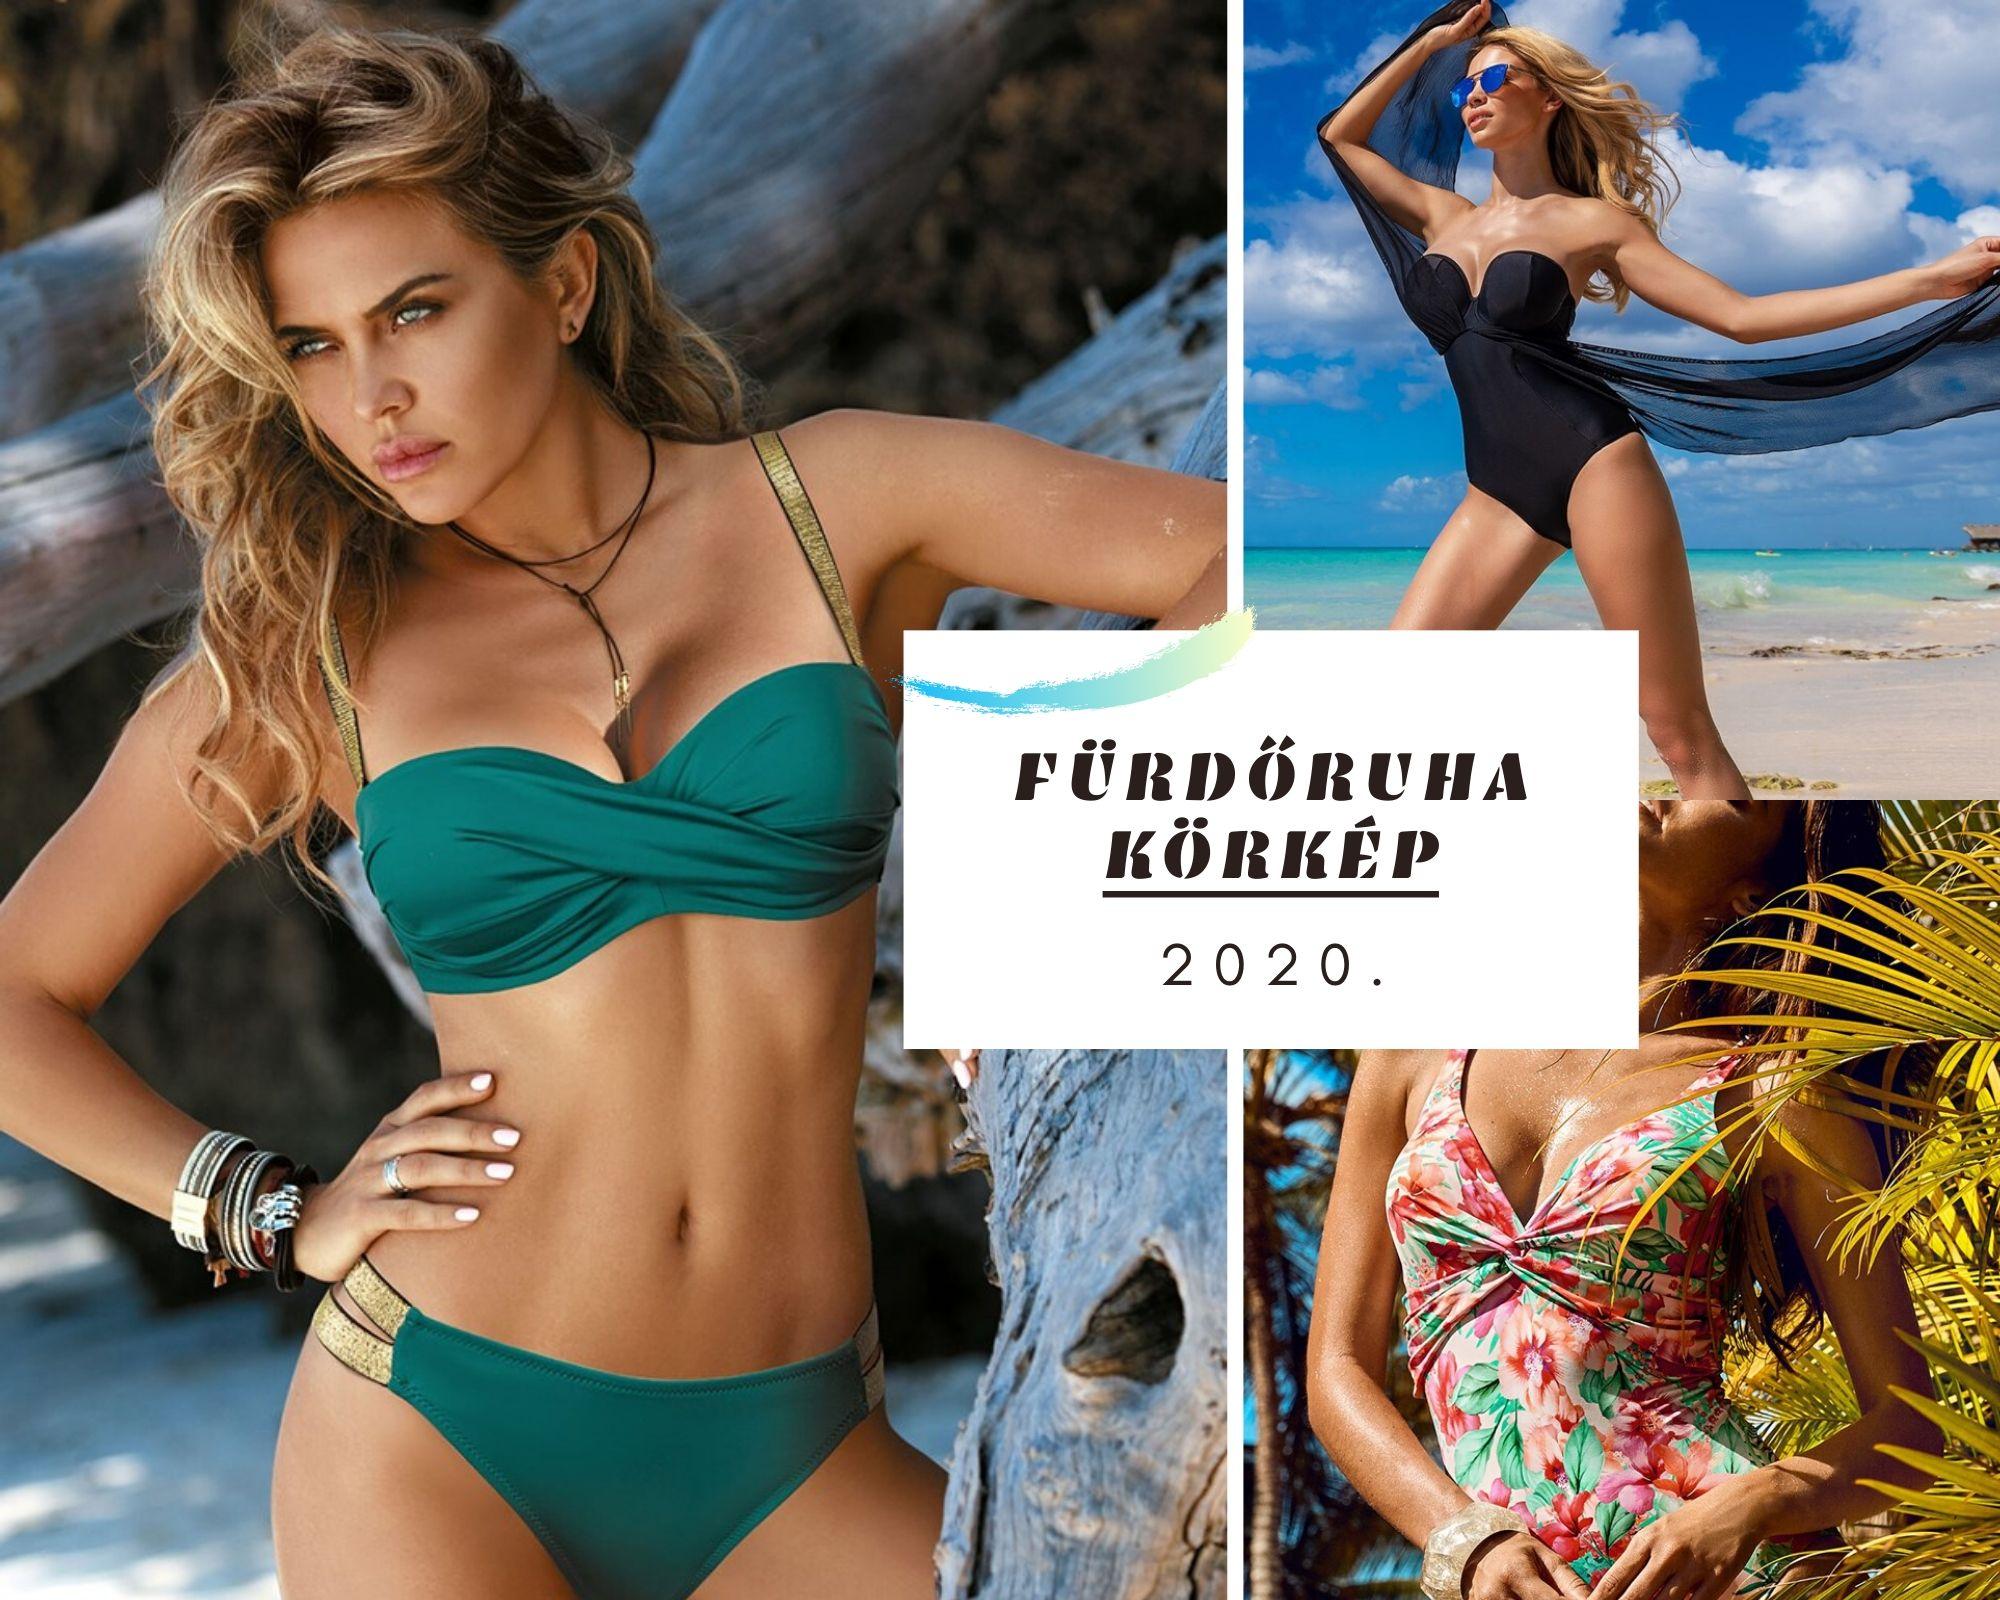 pastel_photo_sale_retail_stores_photo_collage.jpg